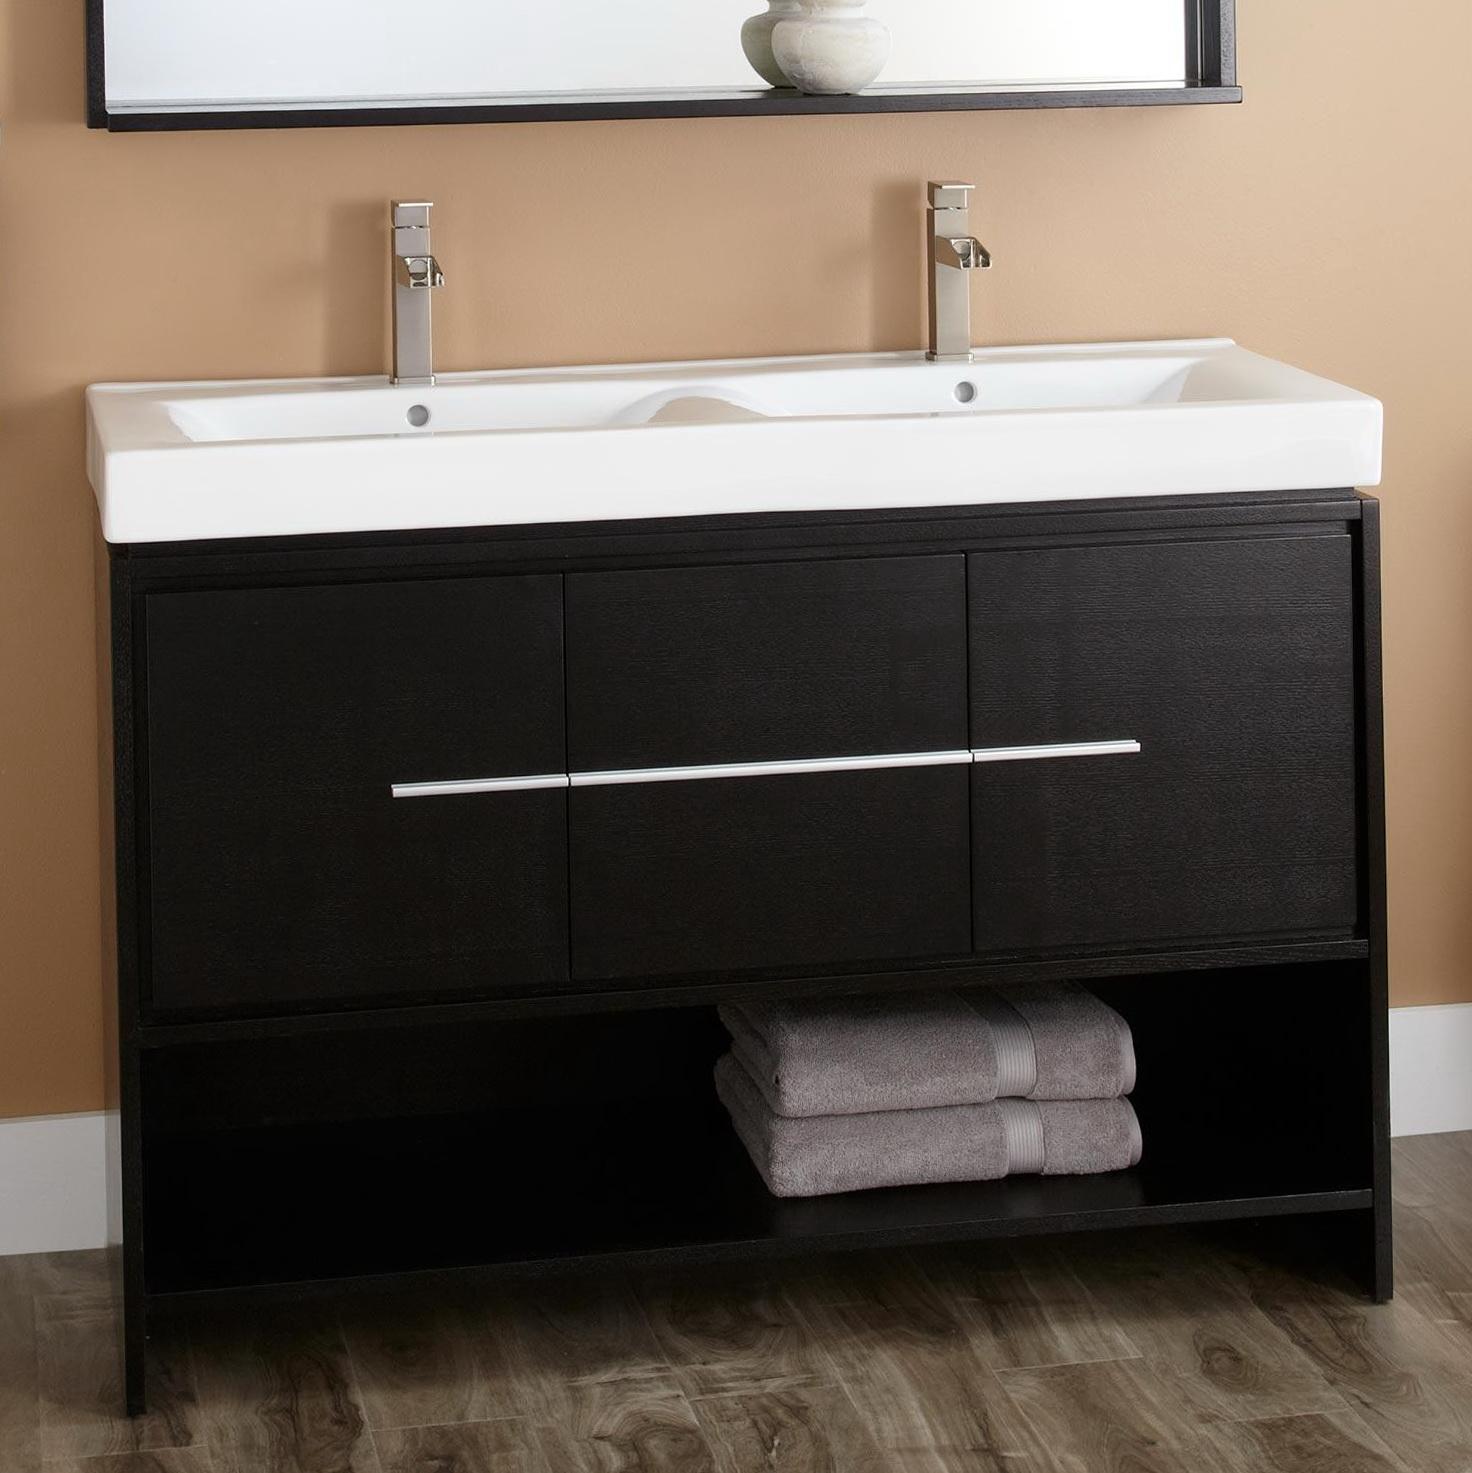 Double Vanity Bathroom Sinks